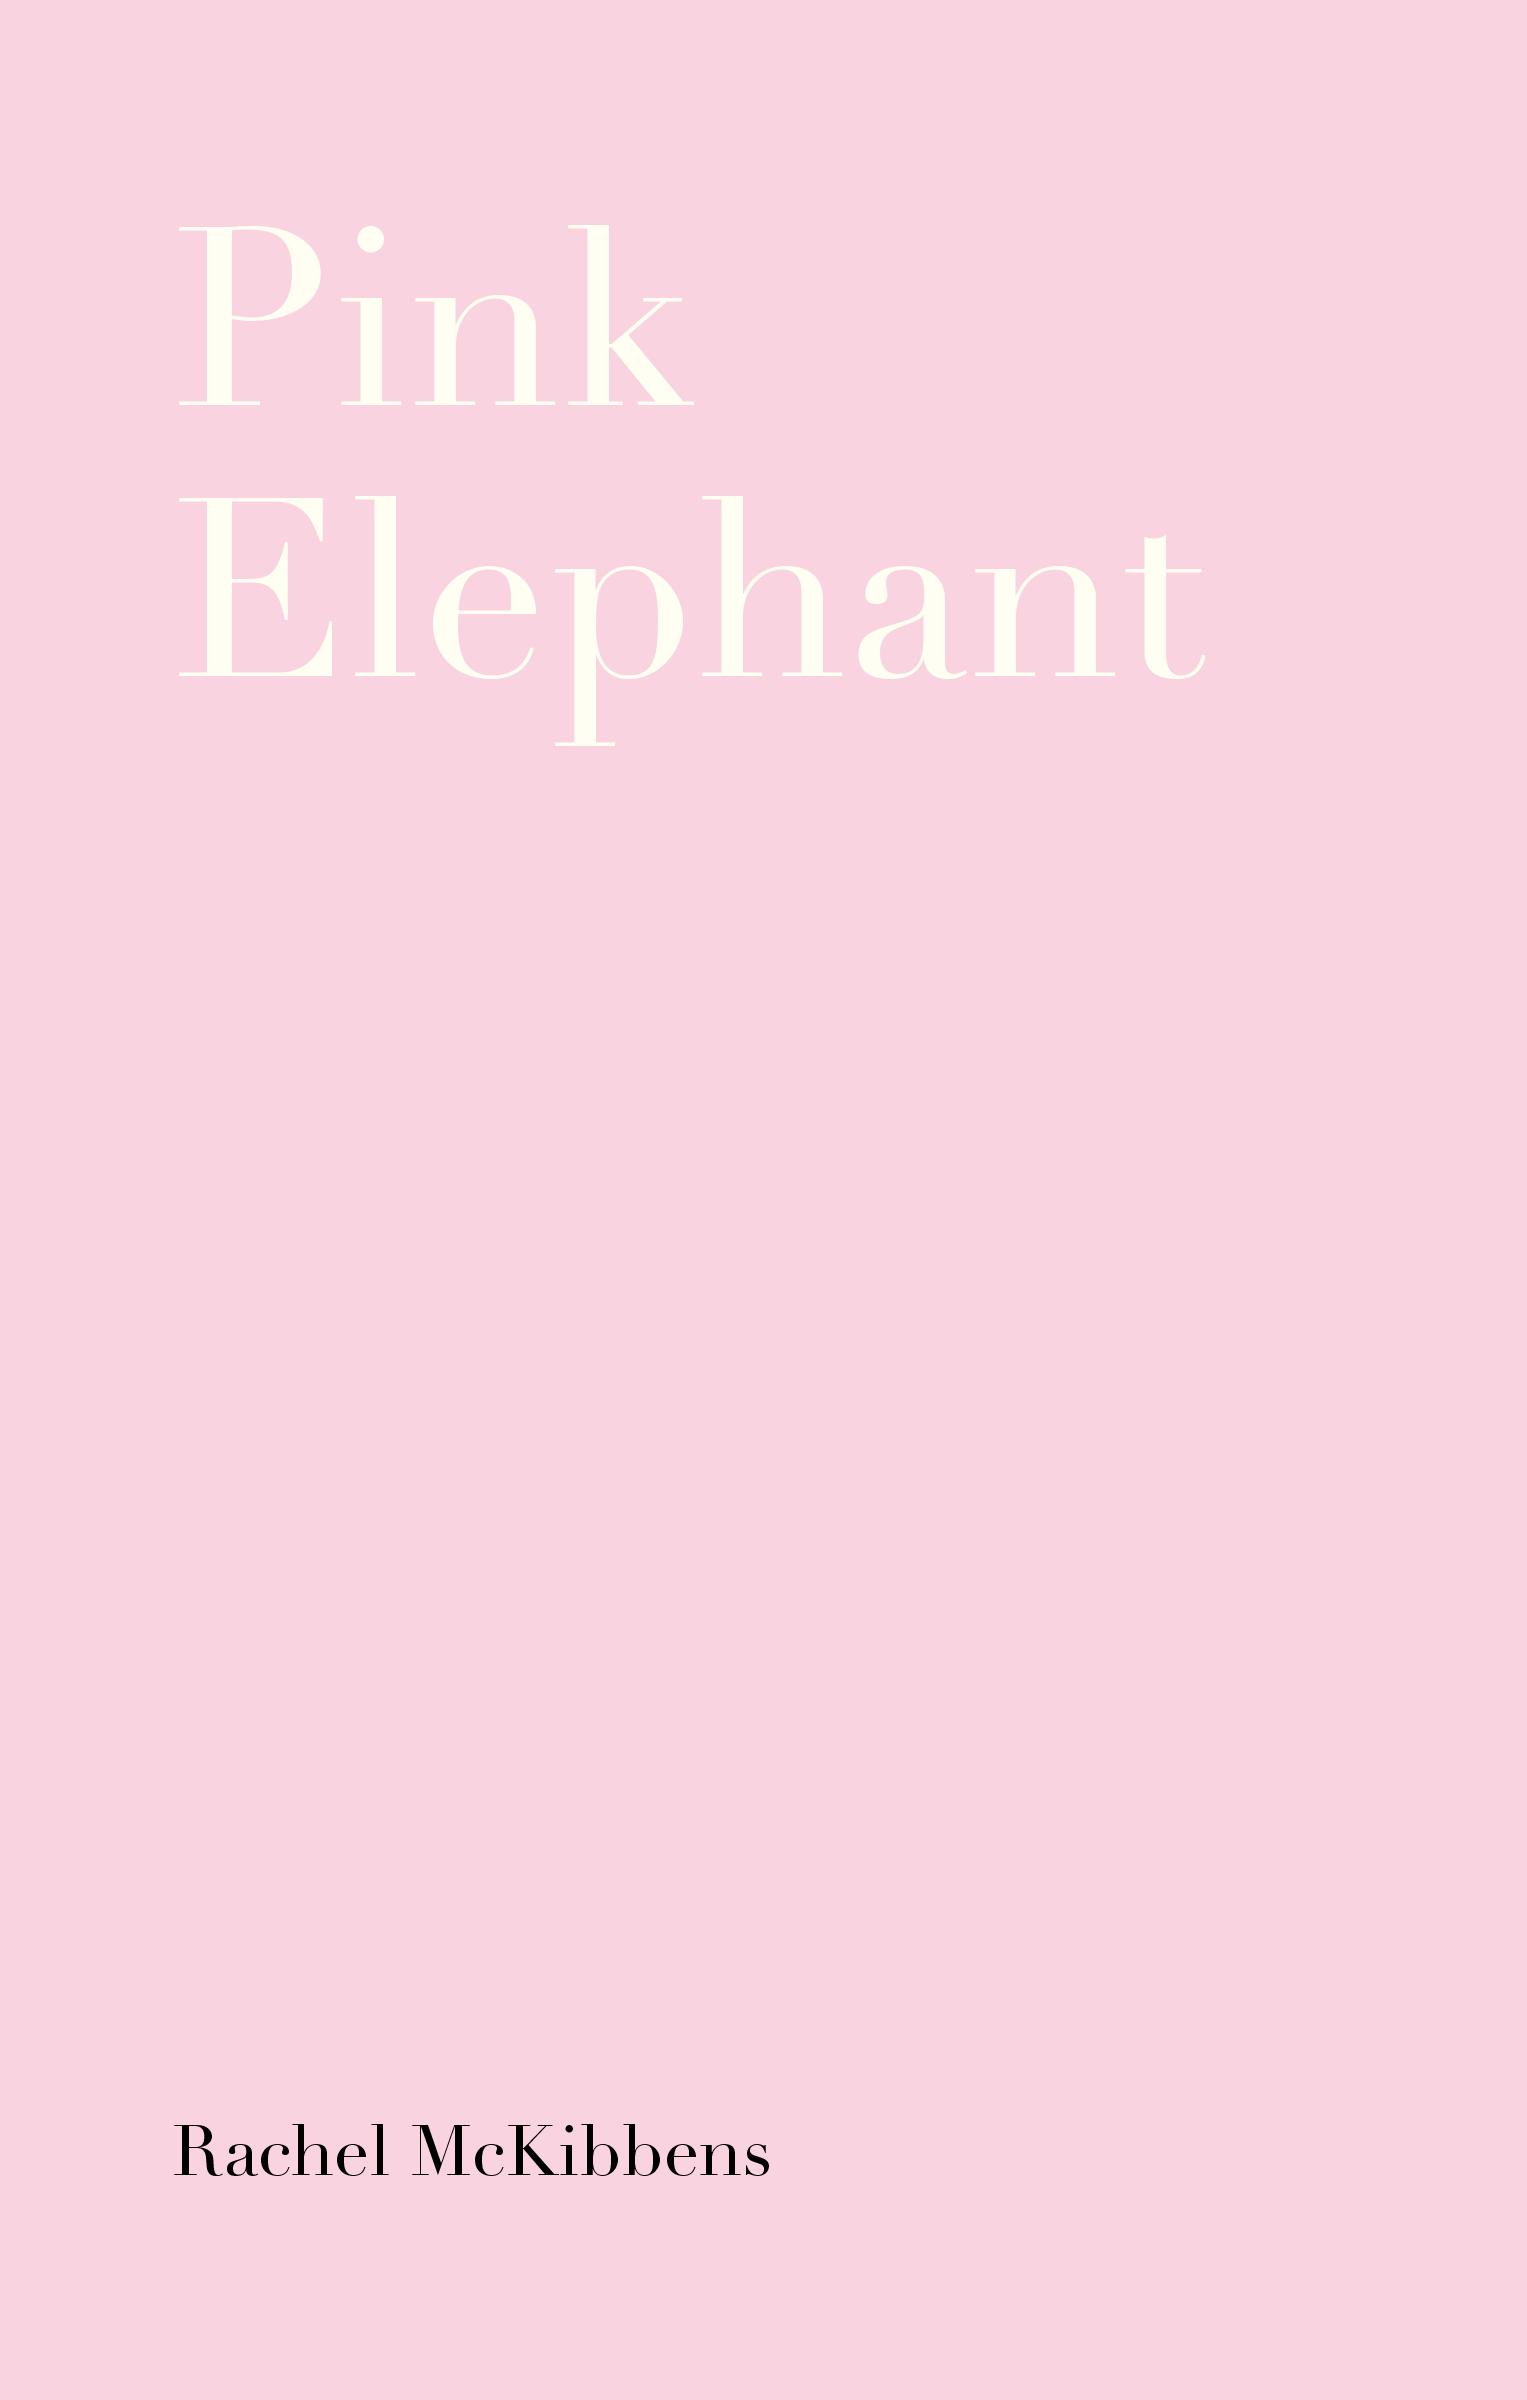 Pink by Rachel McKibbens (Small Doggies Press, 2016)